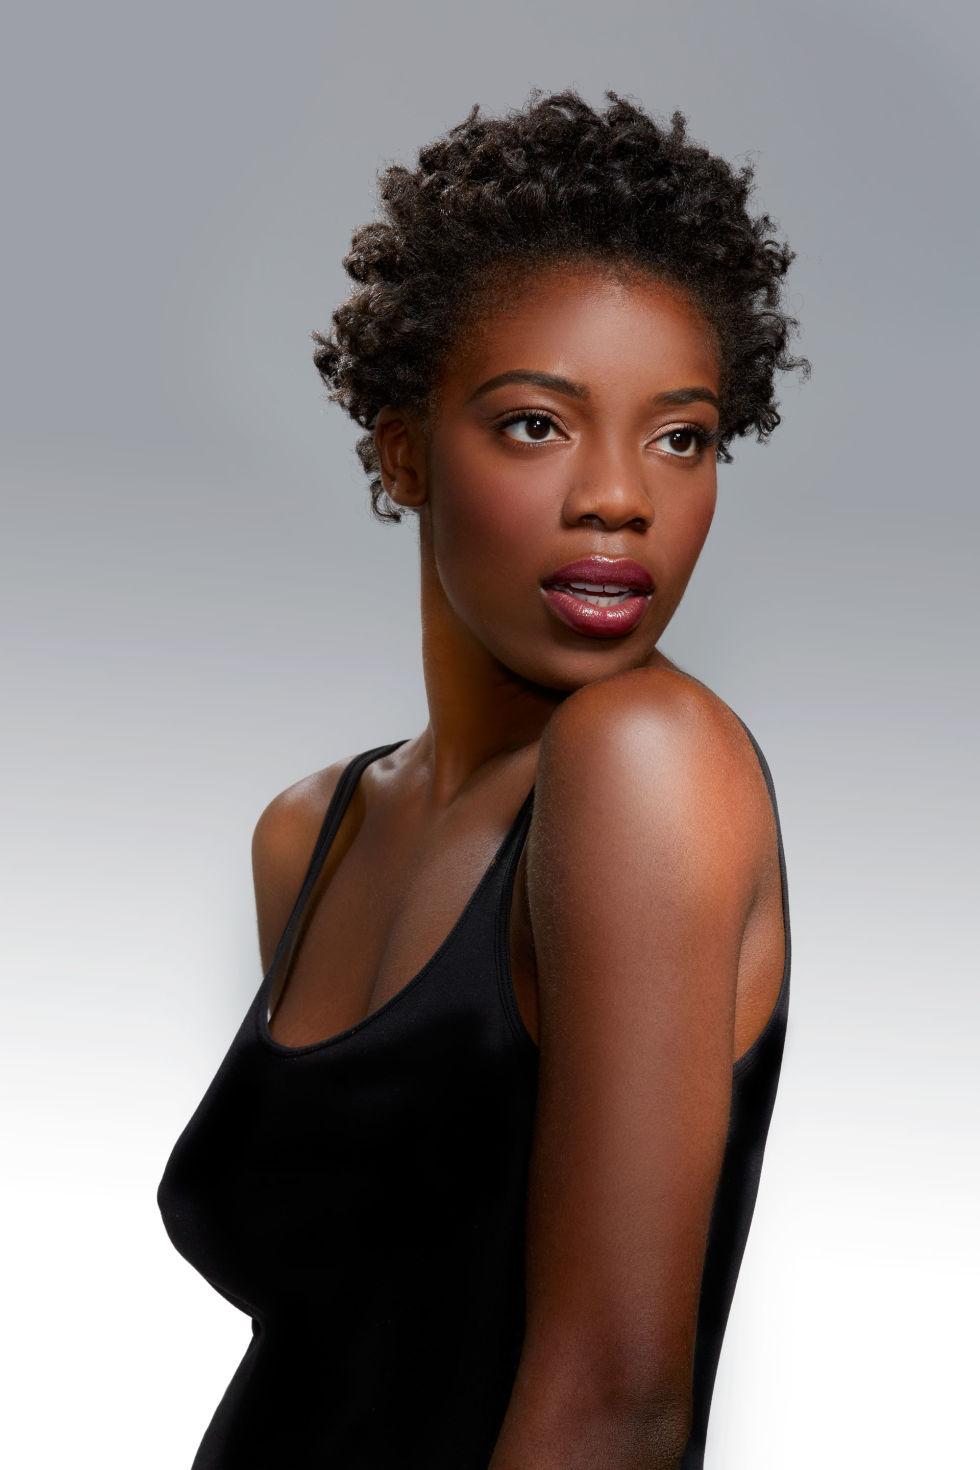 Cool 29 Black Hairstyles Best African American Hairstyles Amp Haircuts Short Hairstyles Gunalazisus